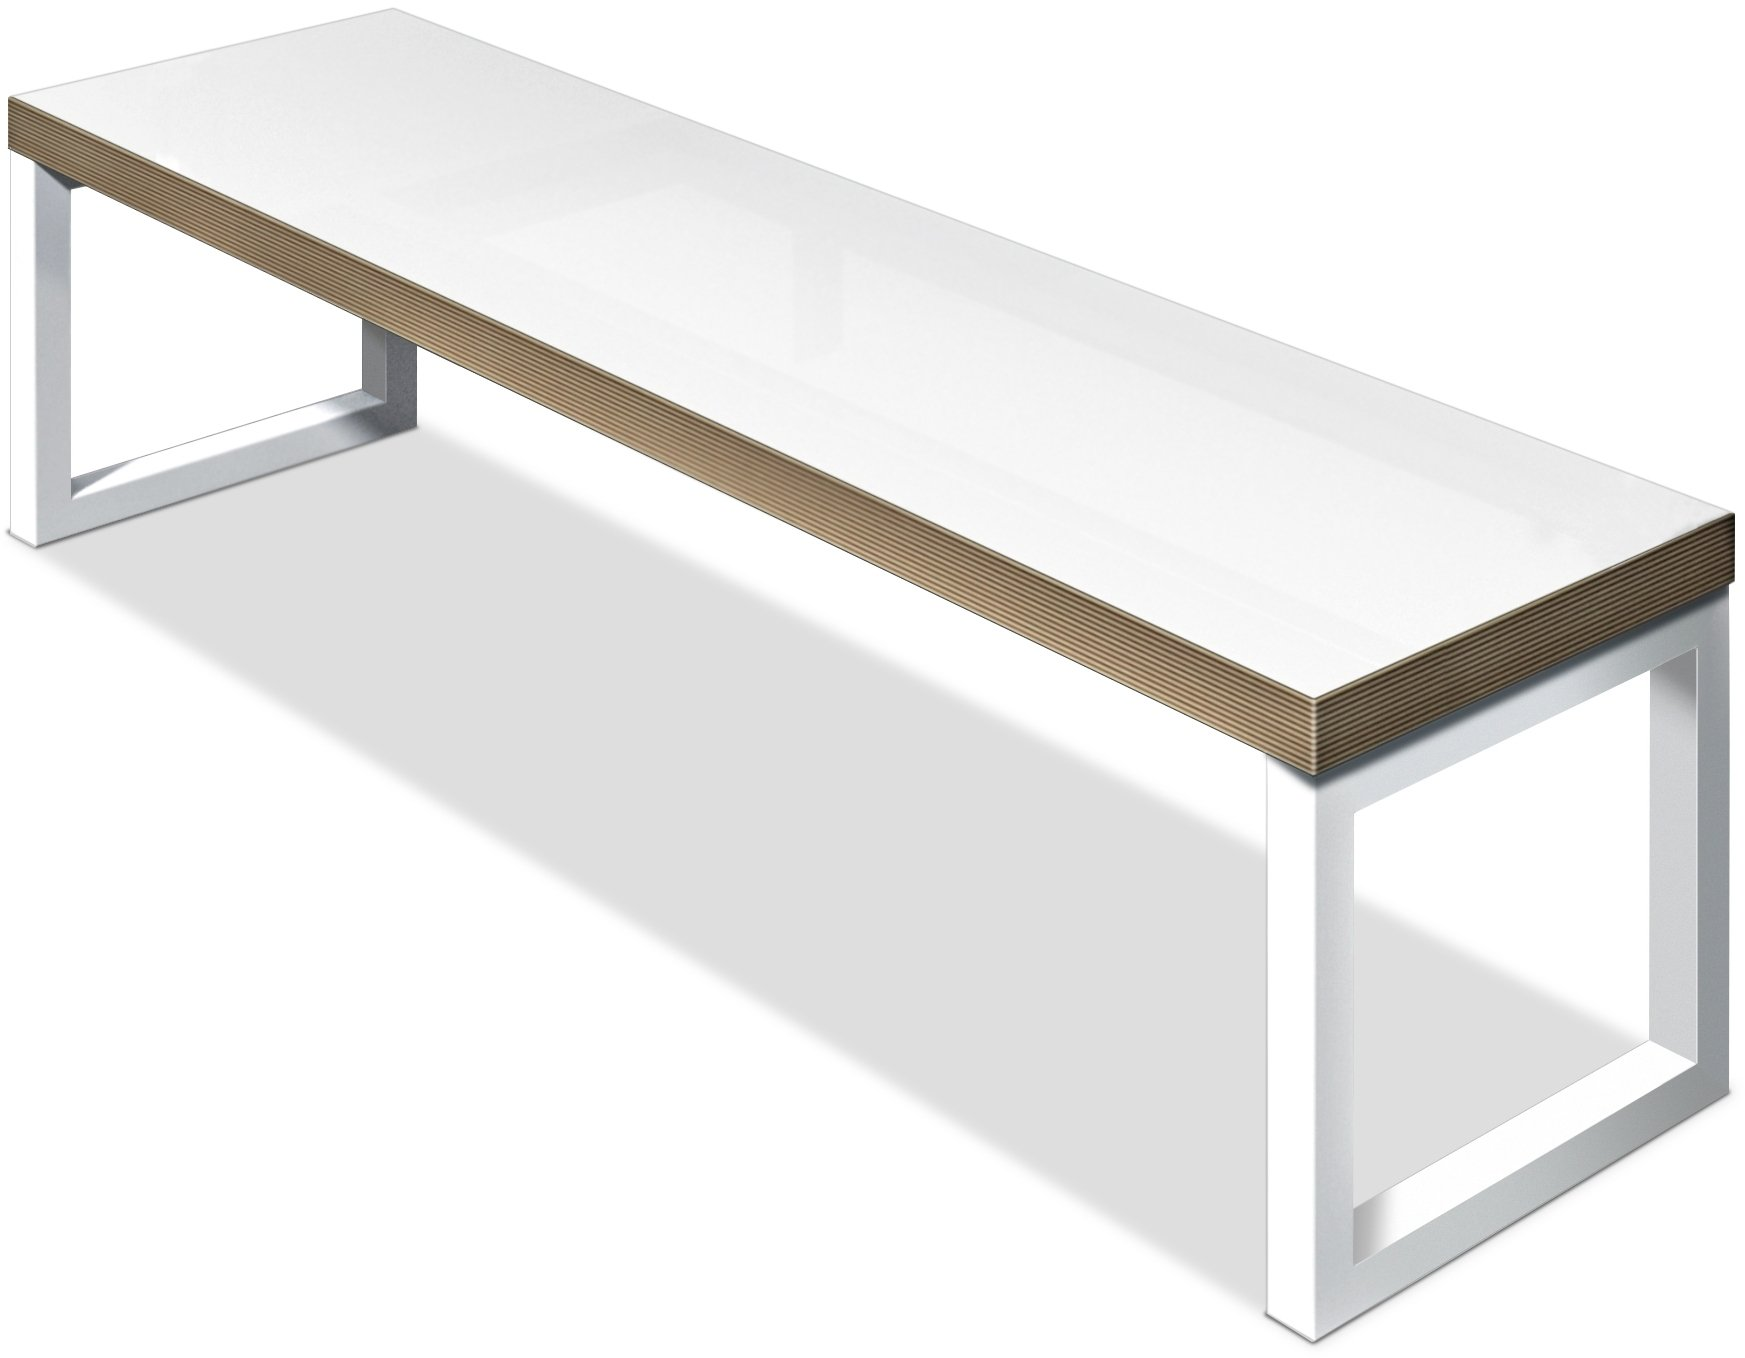 seat illinois benches steal bench rapadouro furniture timber steel park street corten